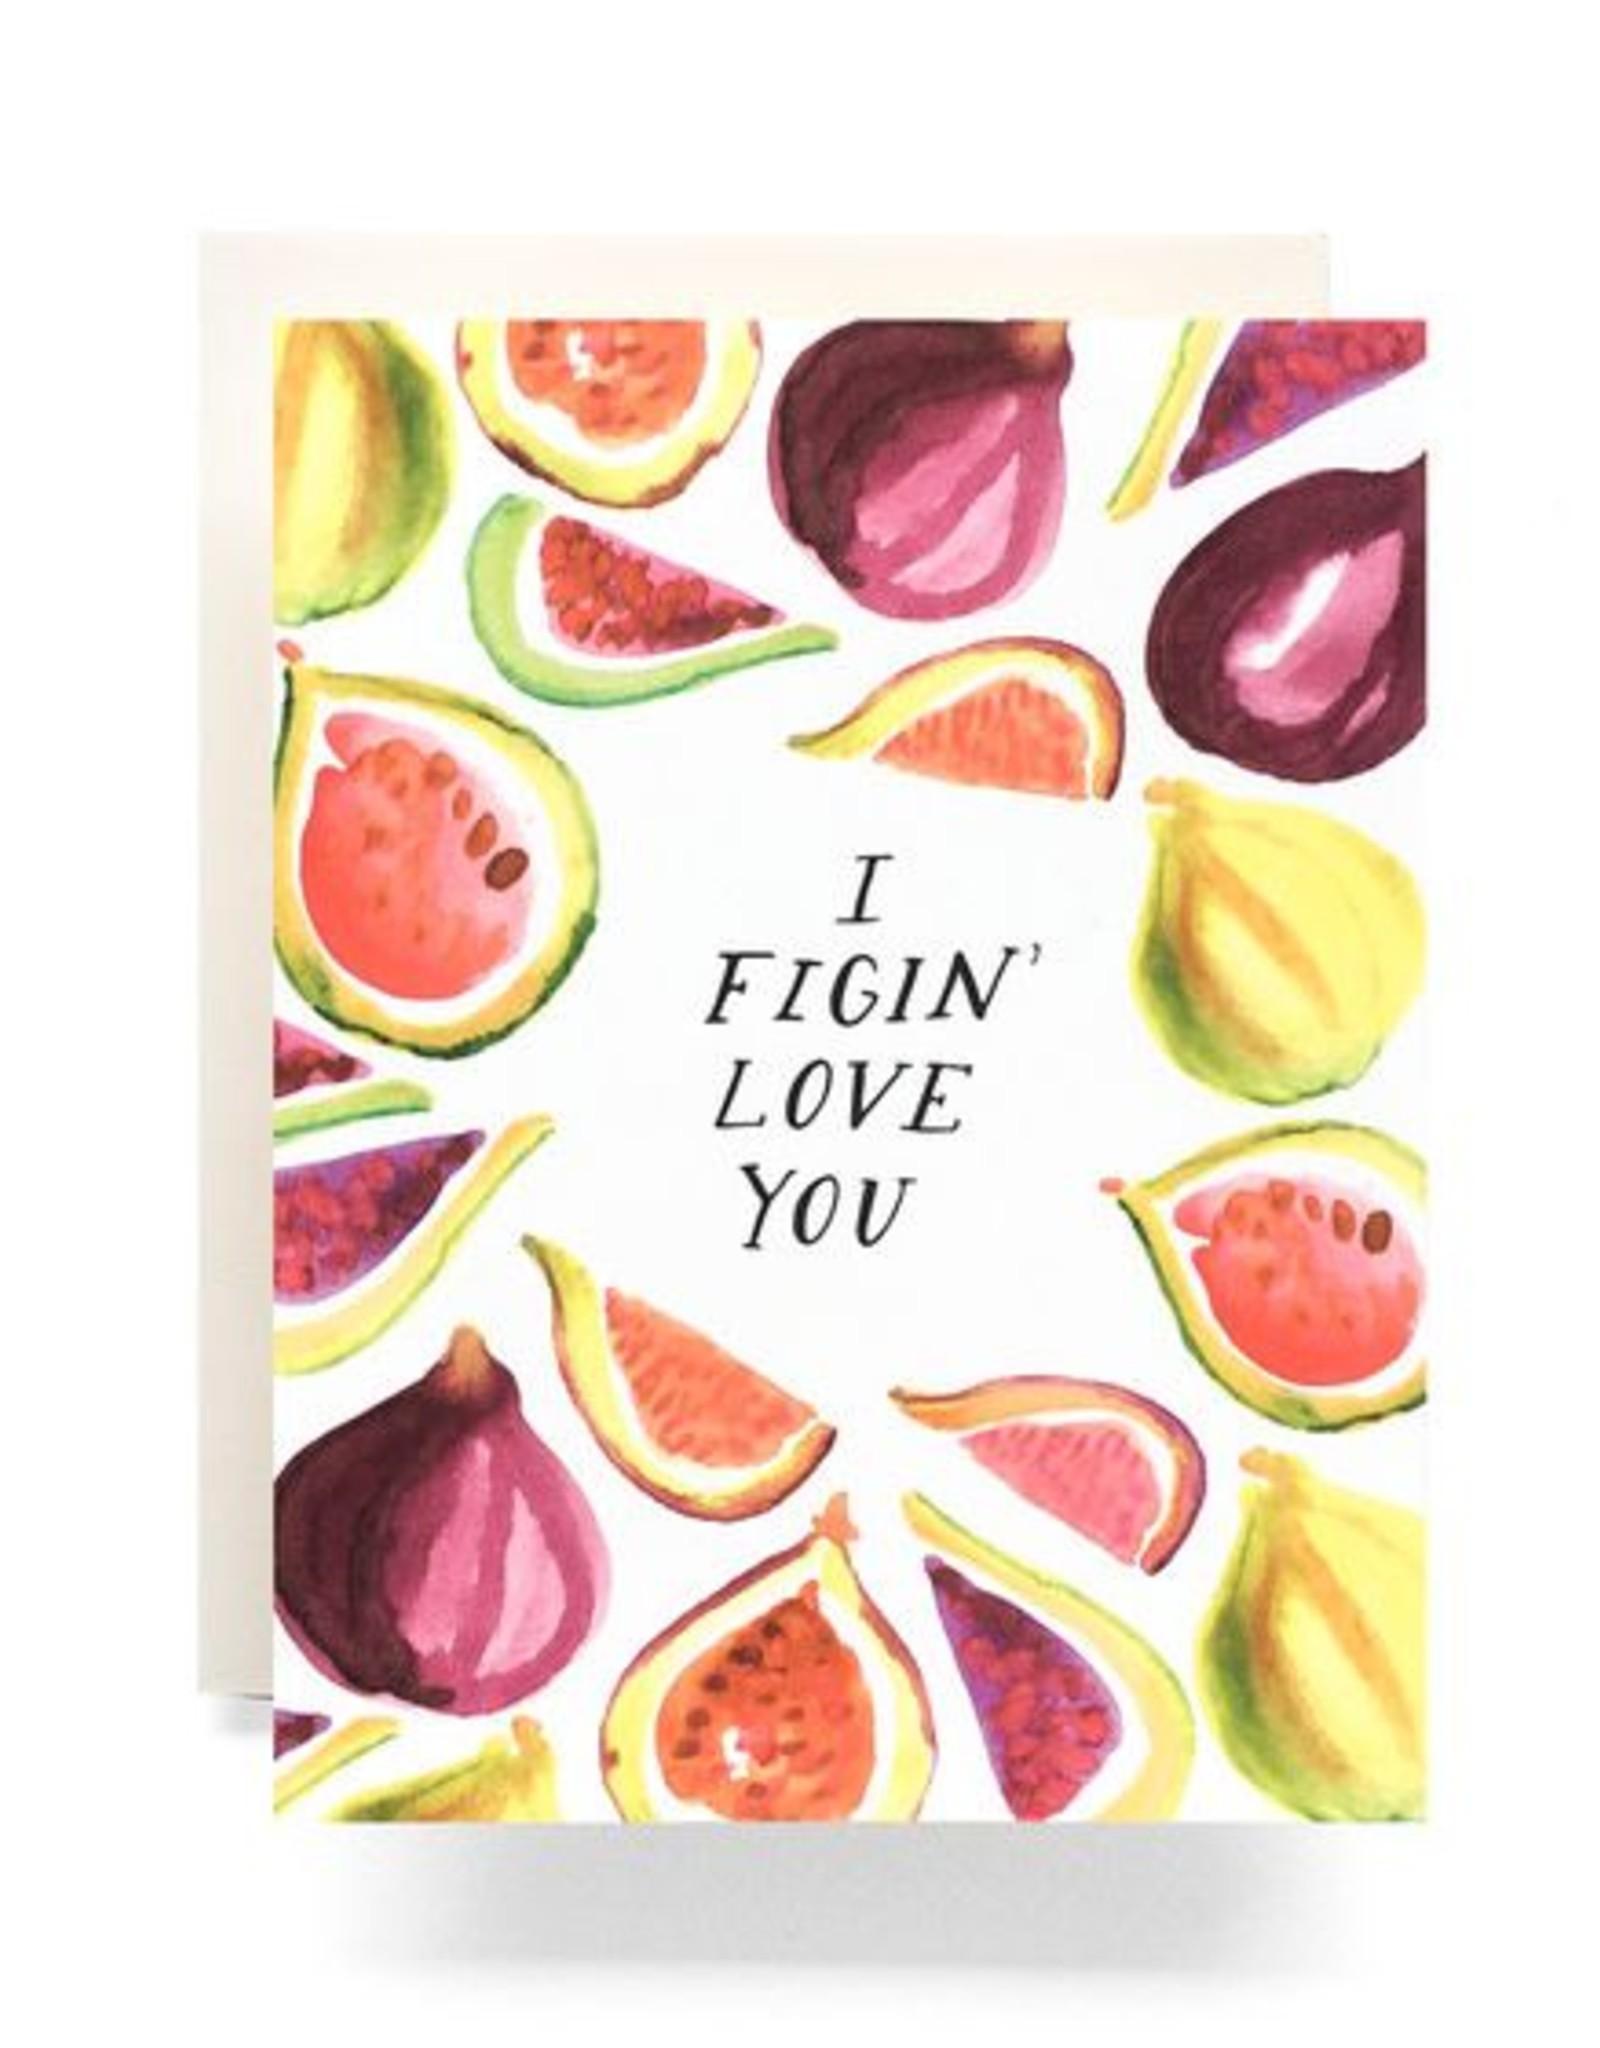 Figin Love You Greeting Card